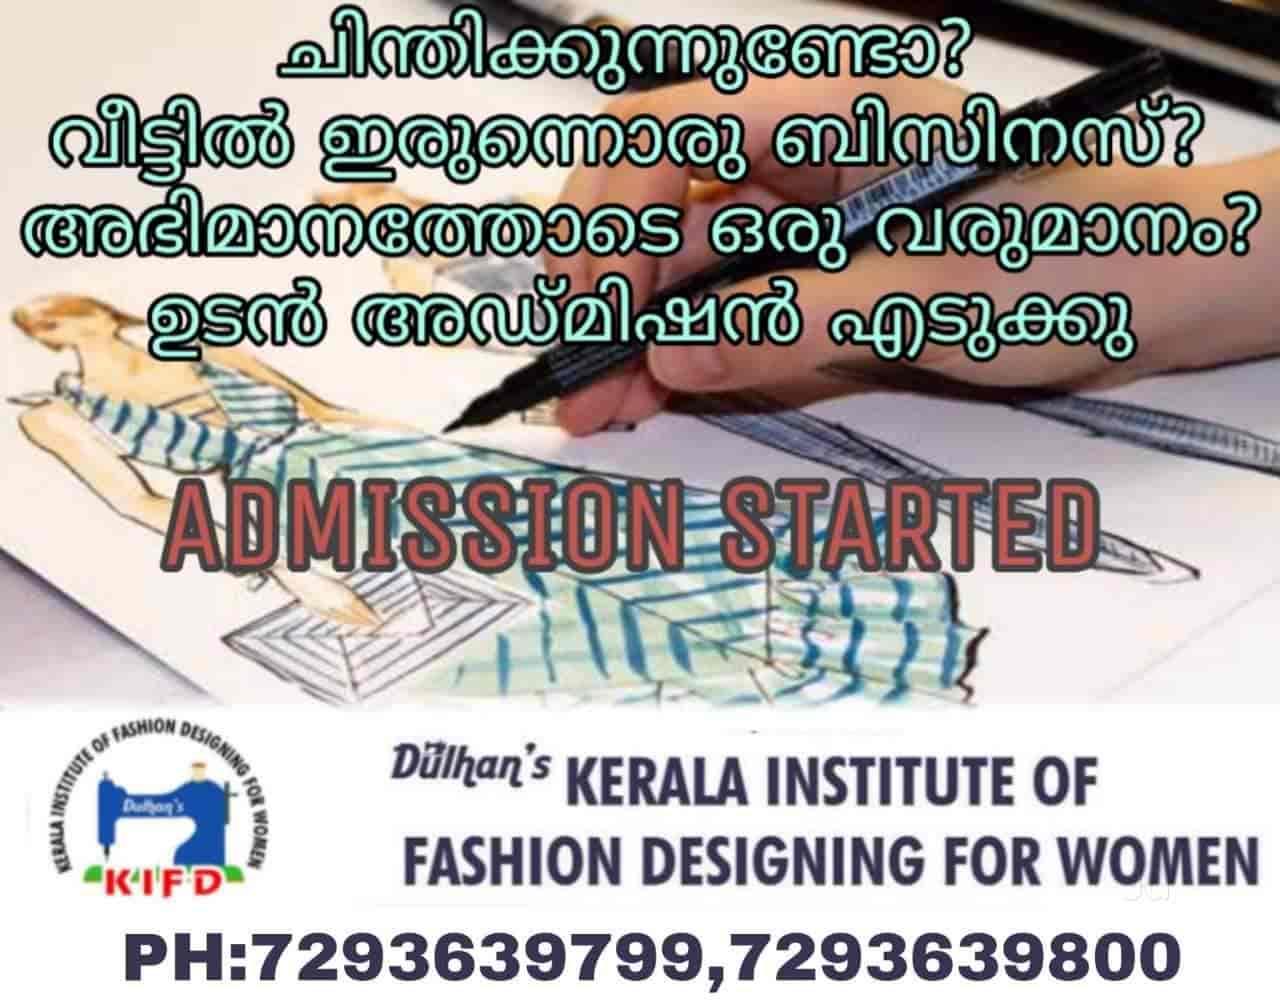 Dulhan S Kerala Institute Of Fashion Designing For Women Manacaud Fashion Designers In Thiruvananthapuram Justdial